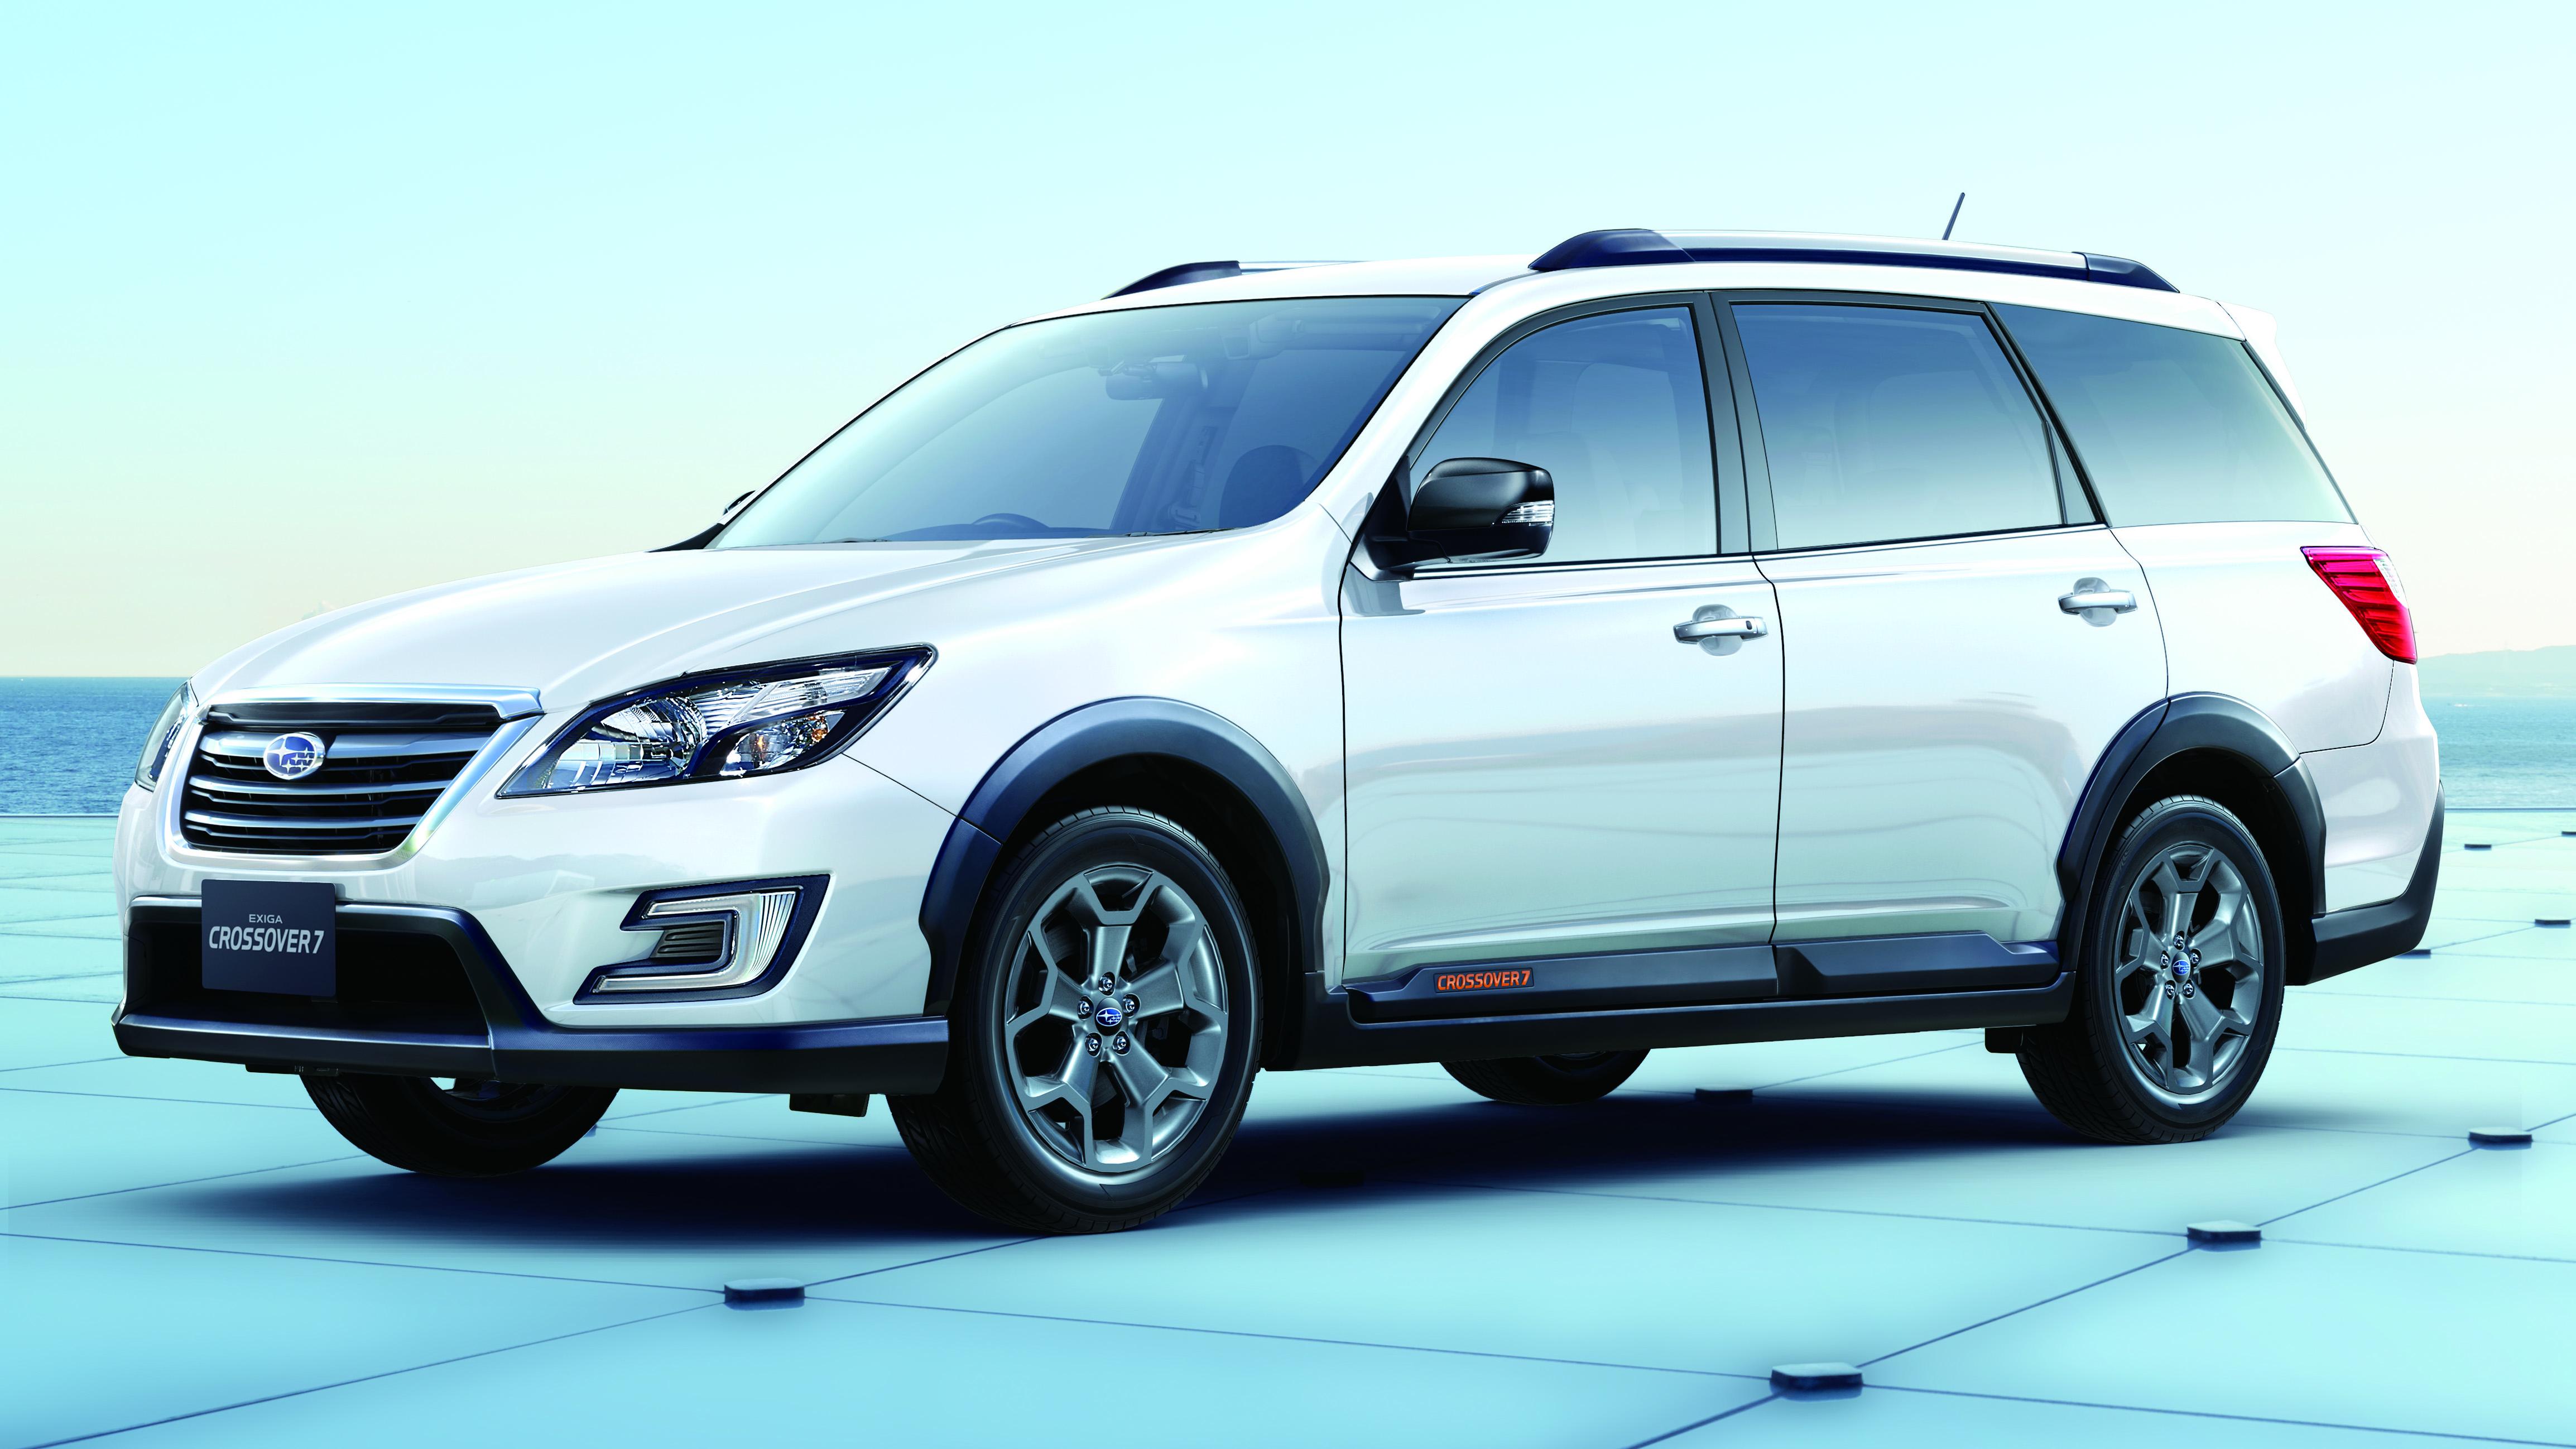 Subaru Exiga Crossover7 gets rugged XBreak trim